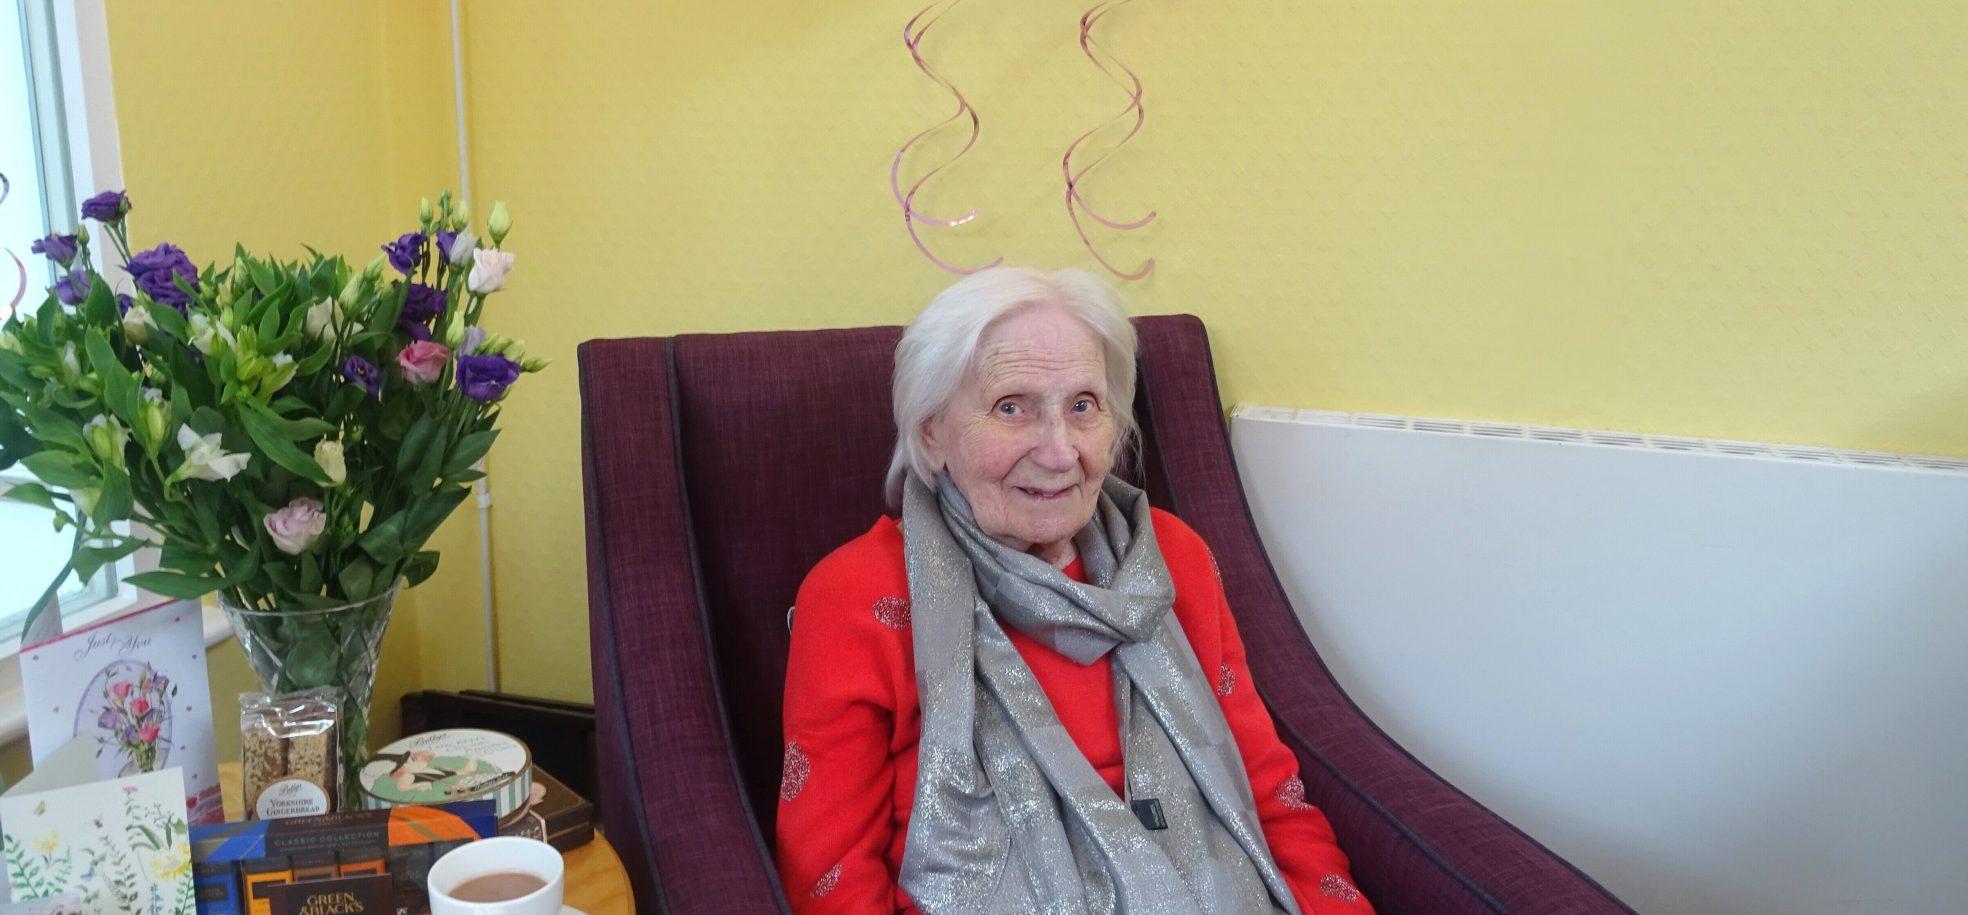 Resident's 100th birhday at Barford Court